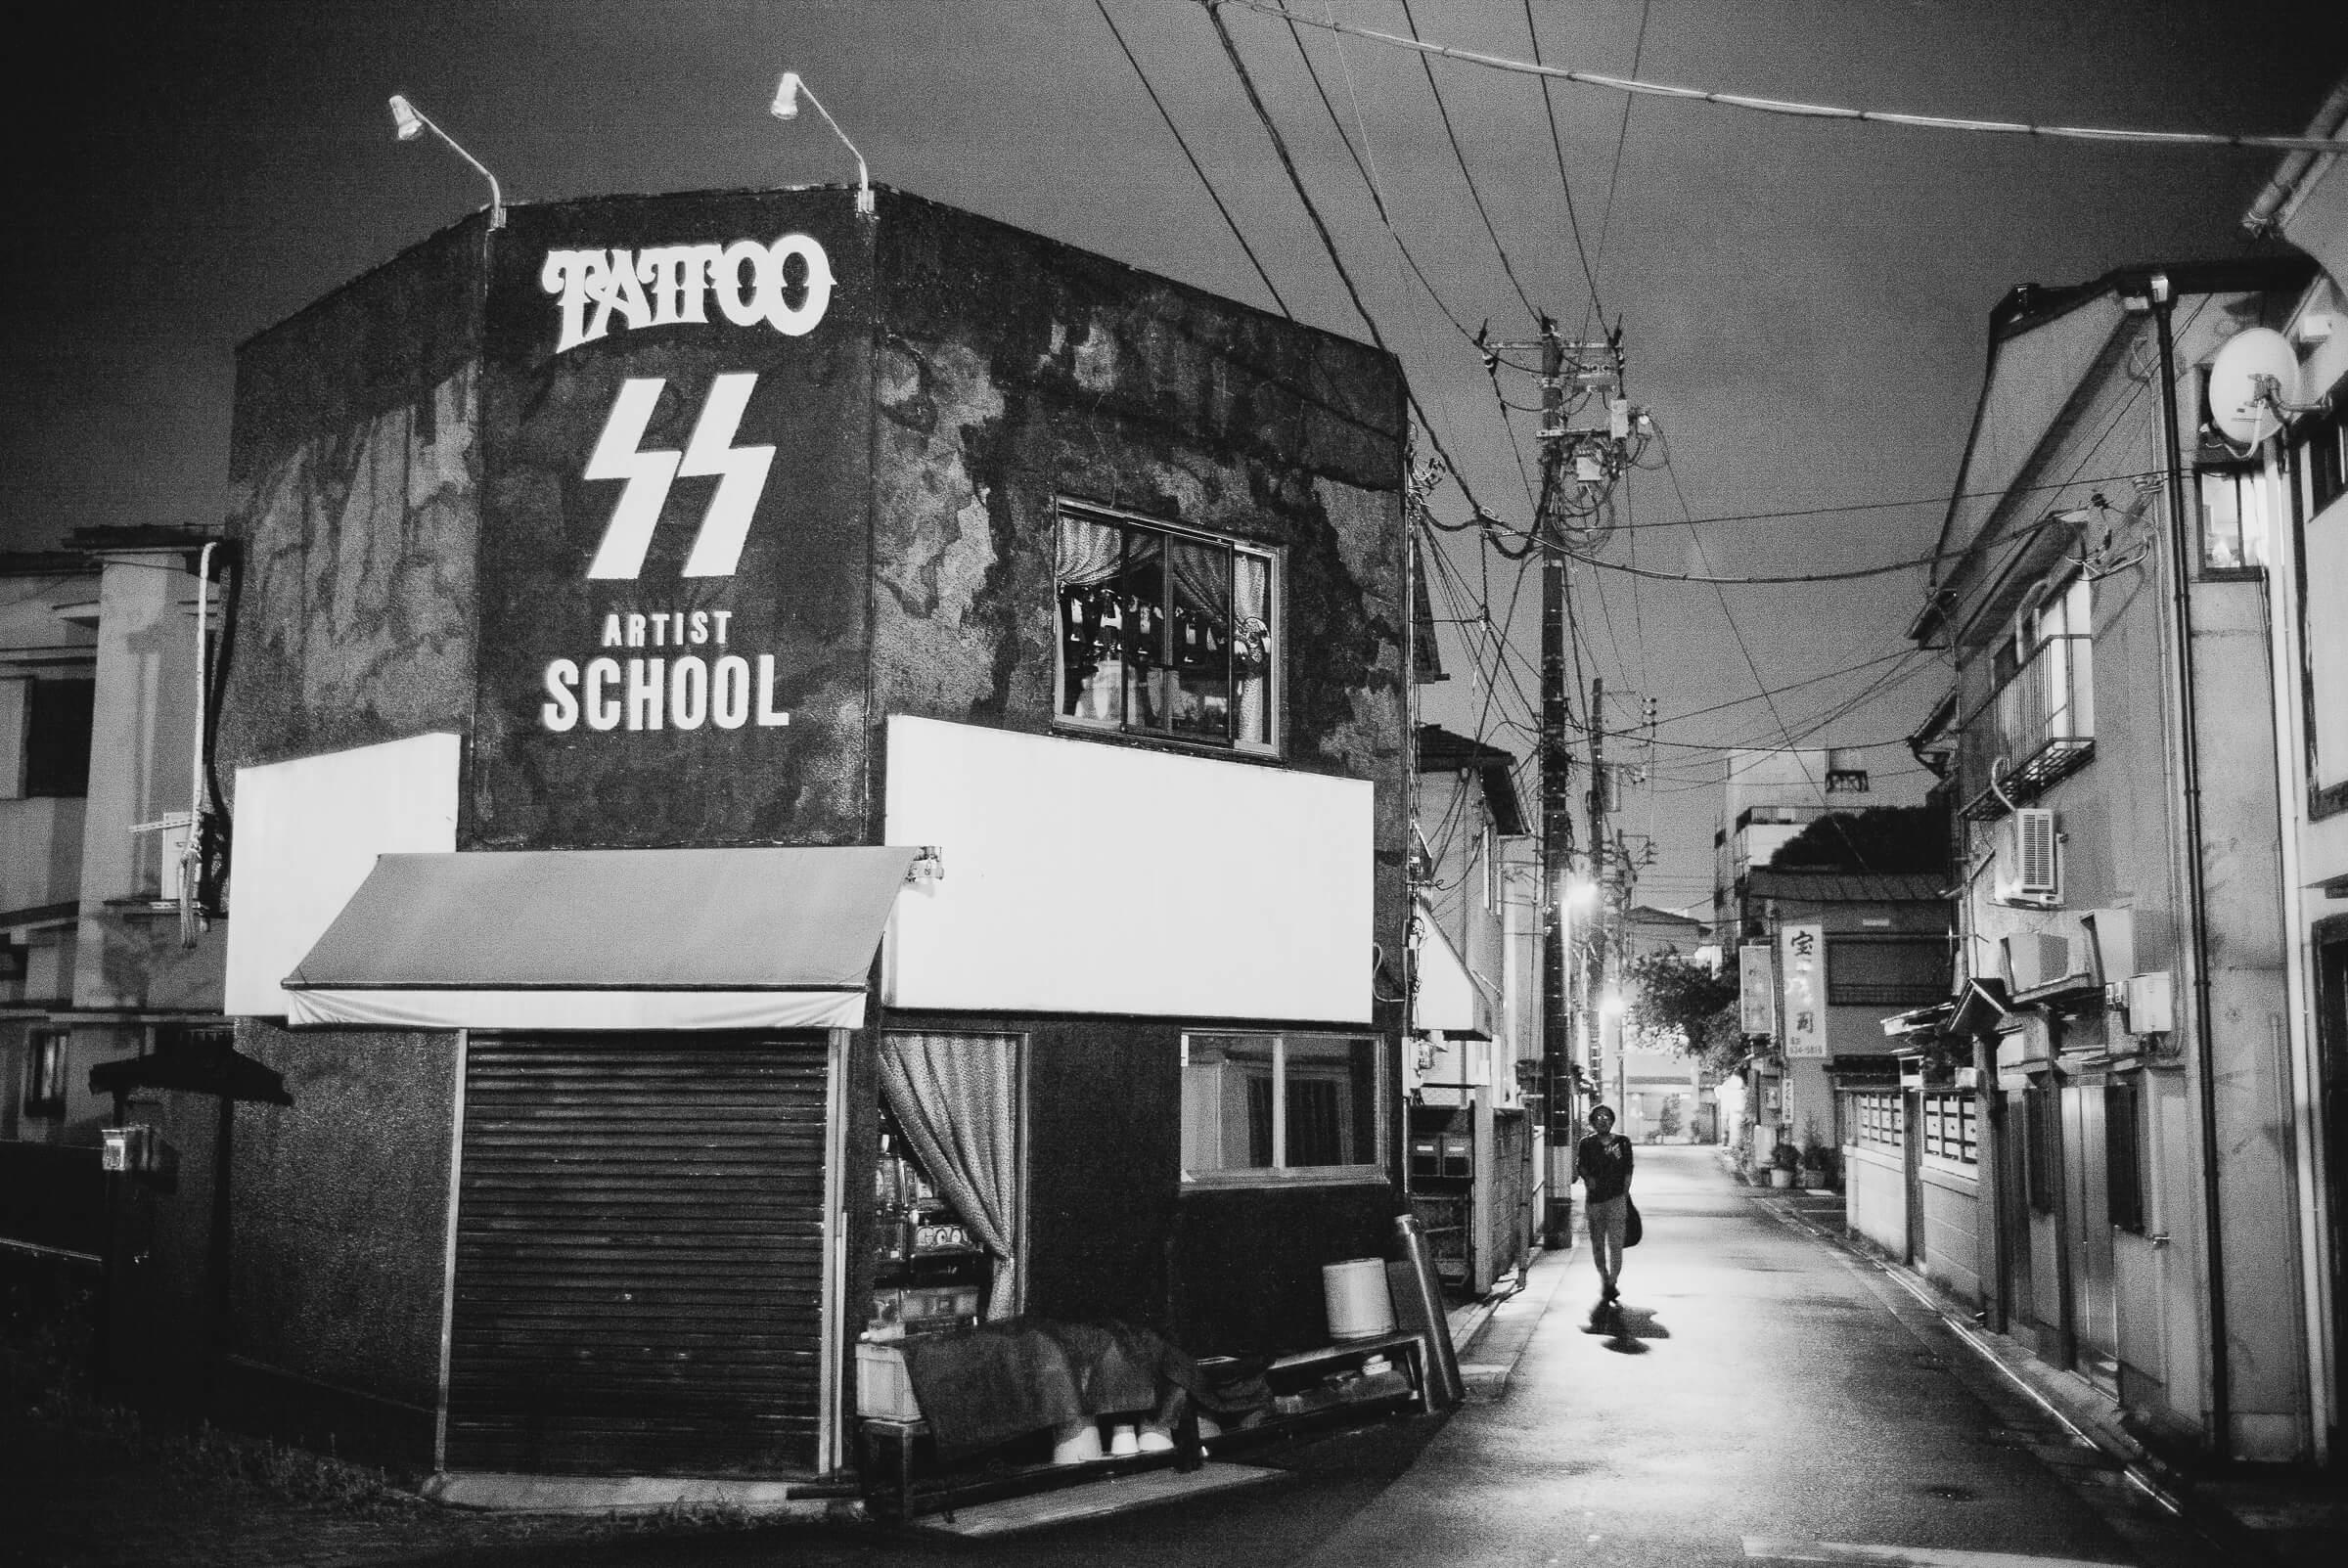 Japanese national socialist tattoo studio tokyo times for Tattoo shops denton tx